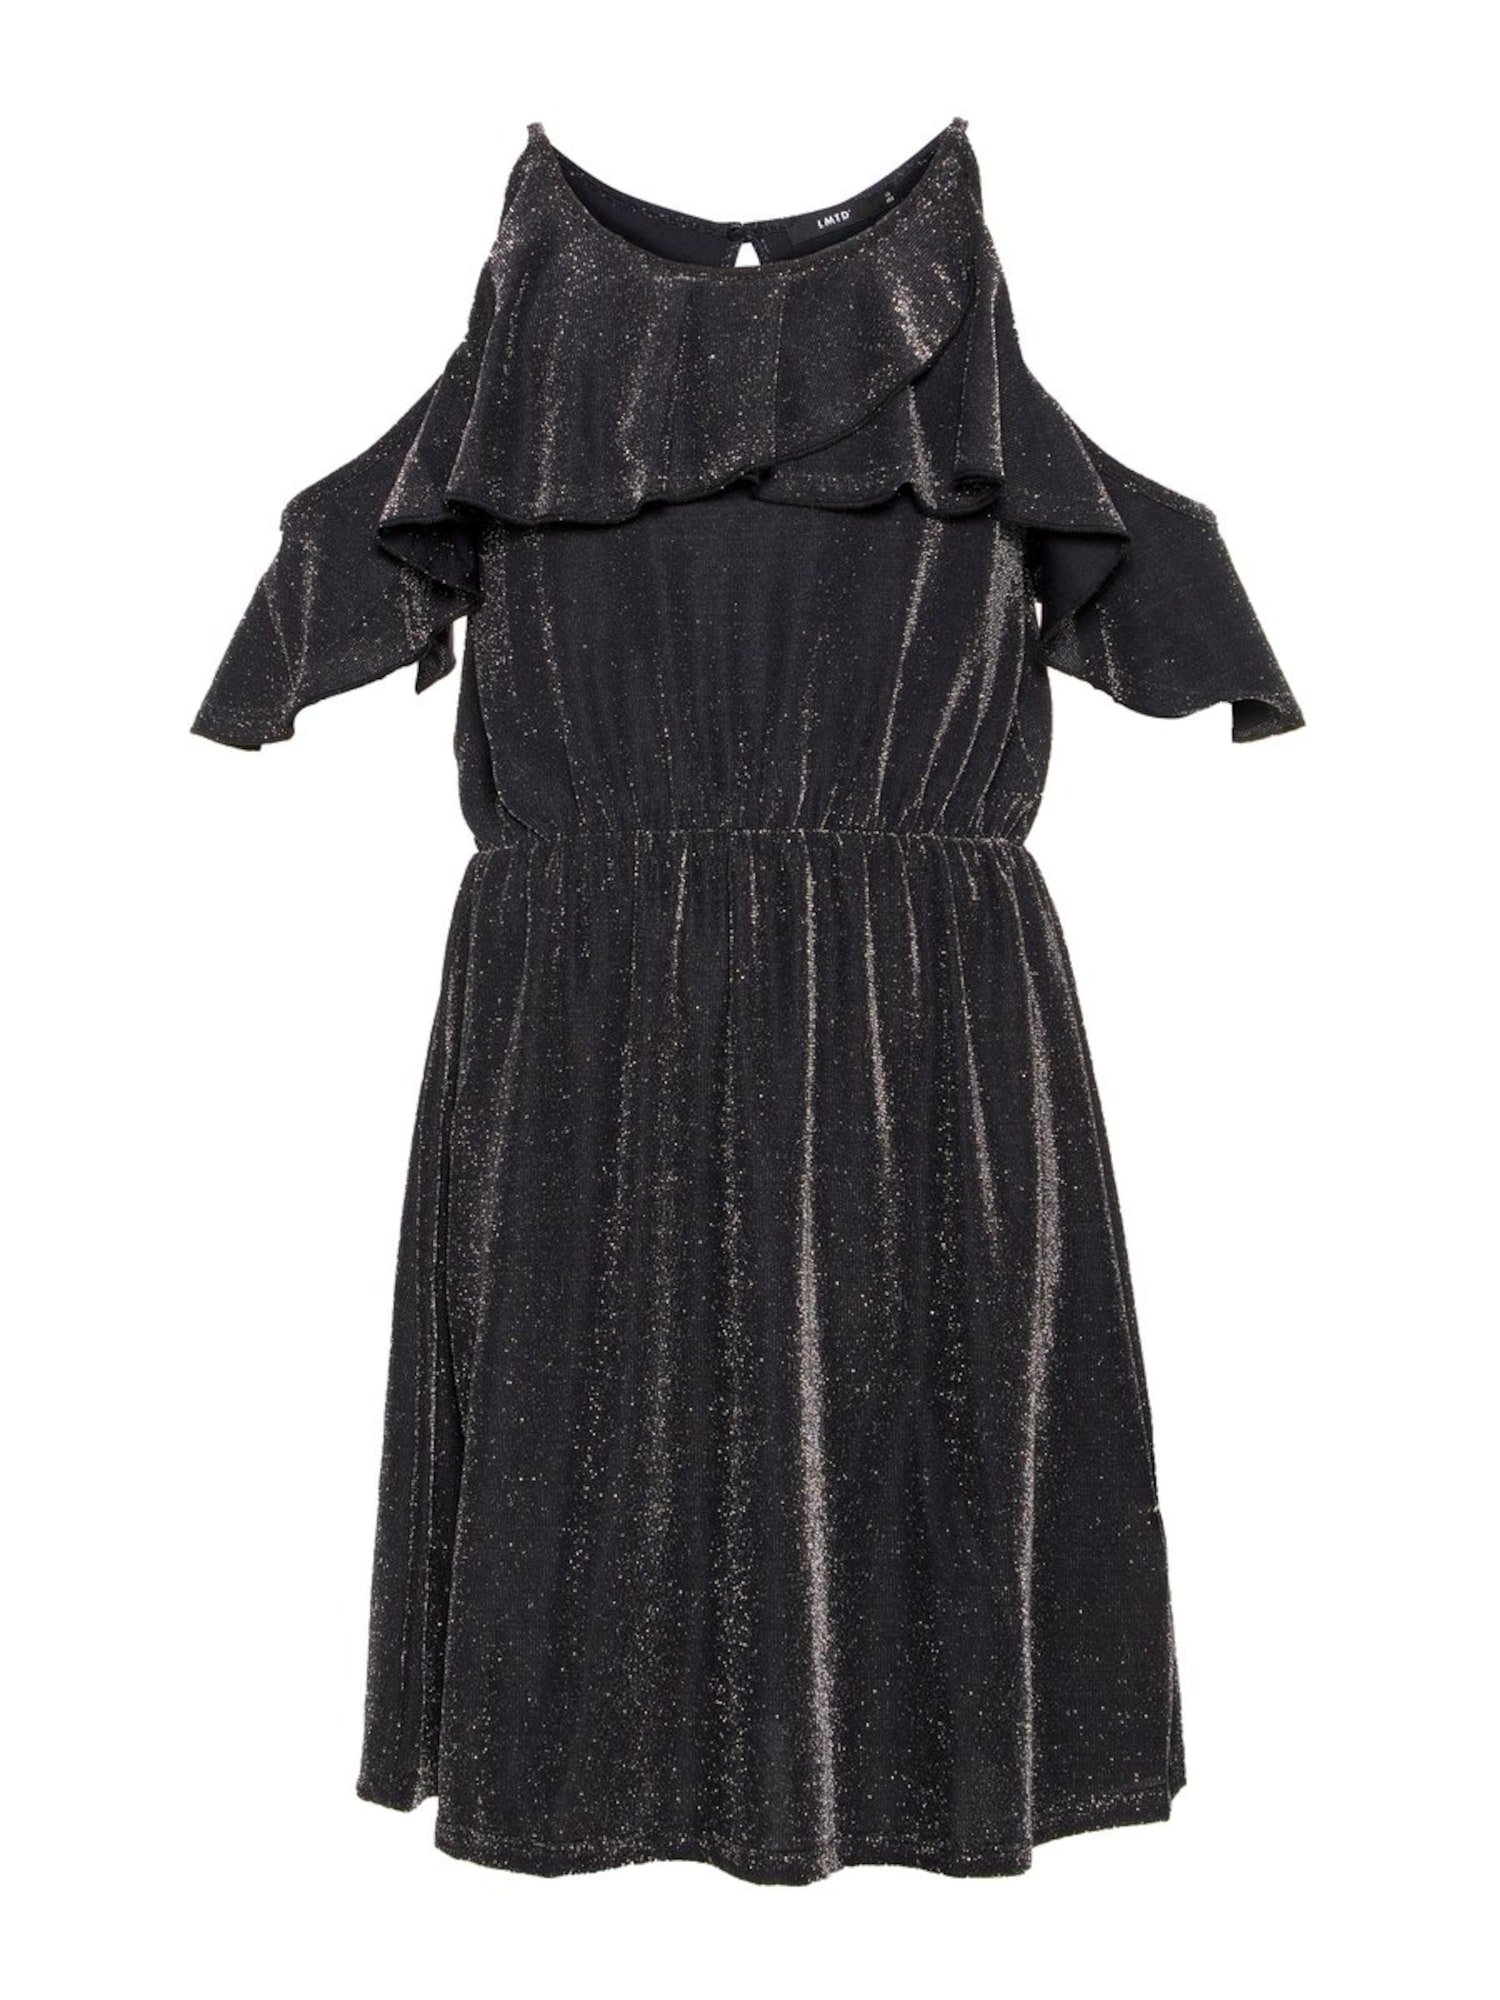 NAME IT Kleid schwarz - Schwarzes Kleid